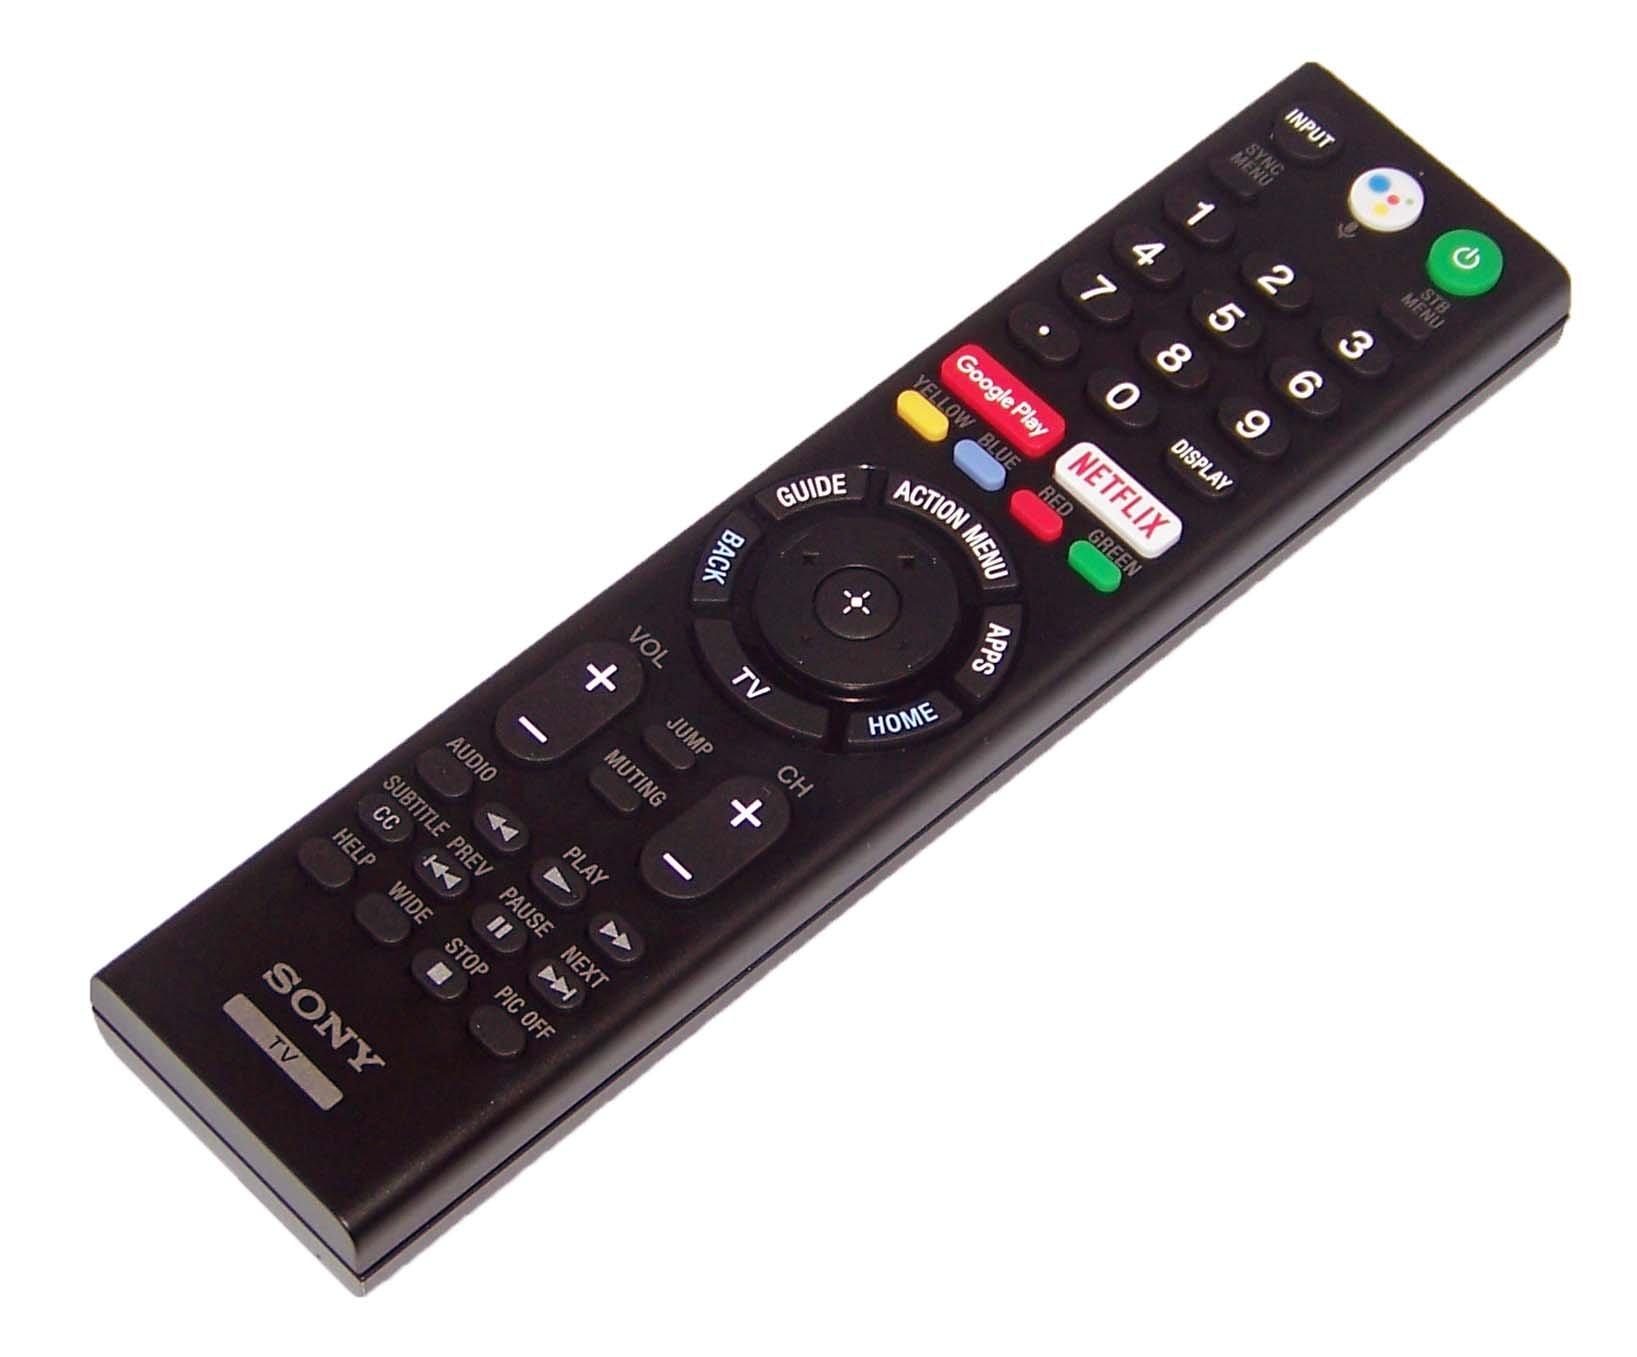 OEM Sony Remote Control Originally Shipped With: XBR49X900F, XBR49X900F, XBR49X900F, XBR-49X900F, XBR55X850F, XBR55X850F